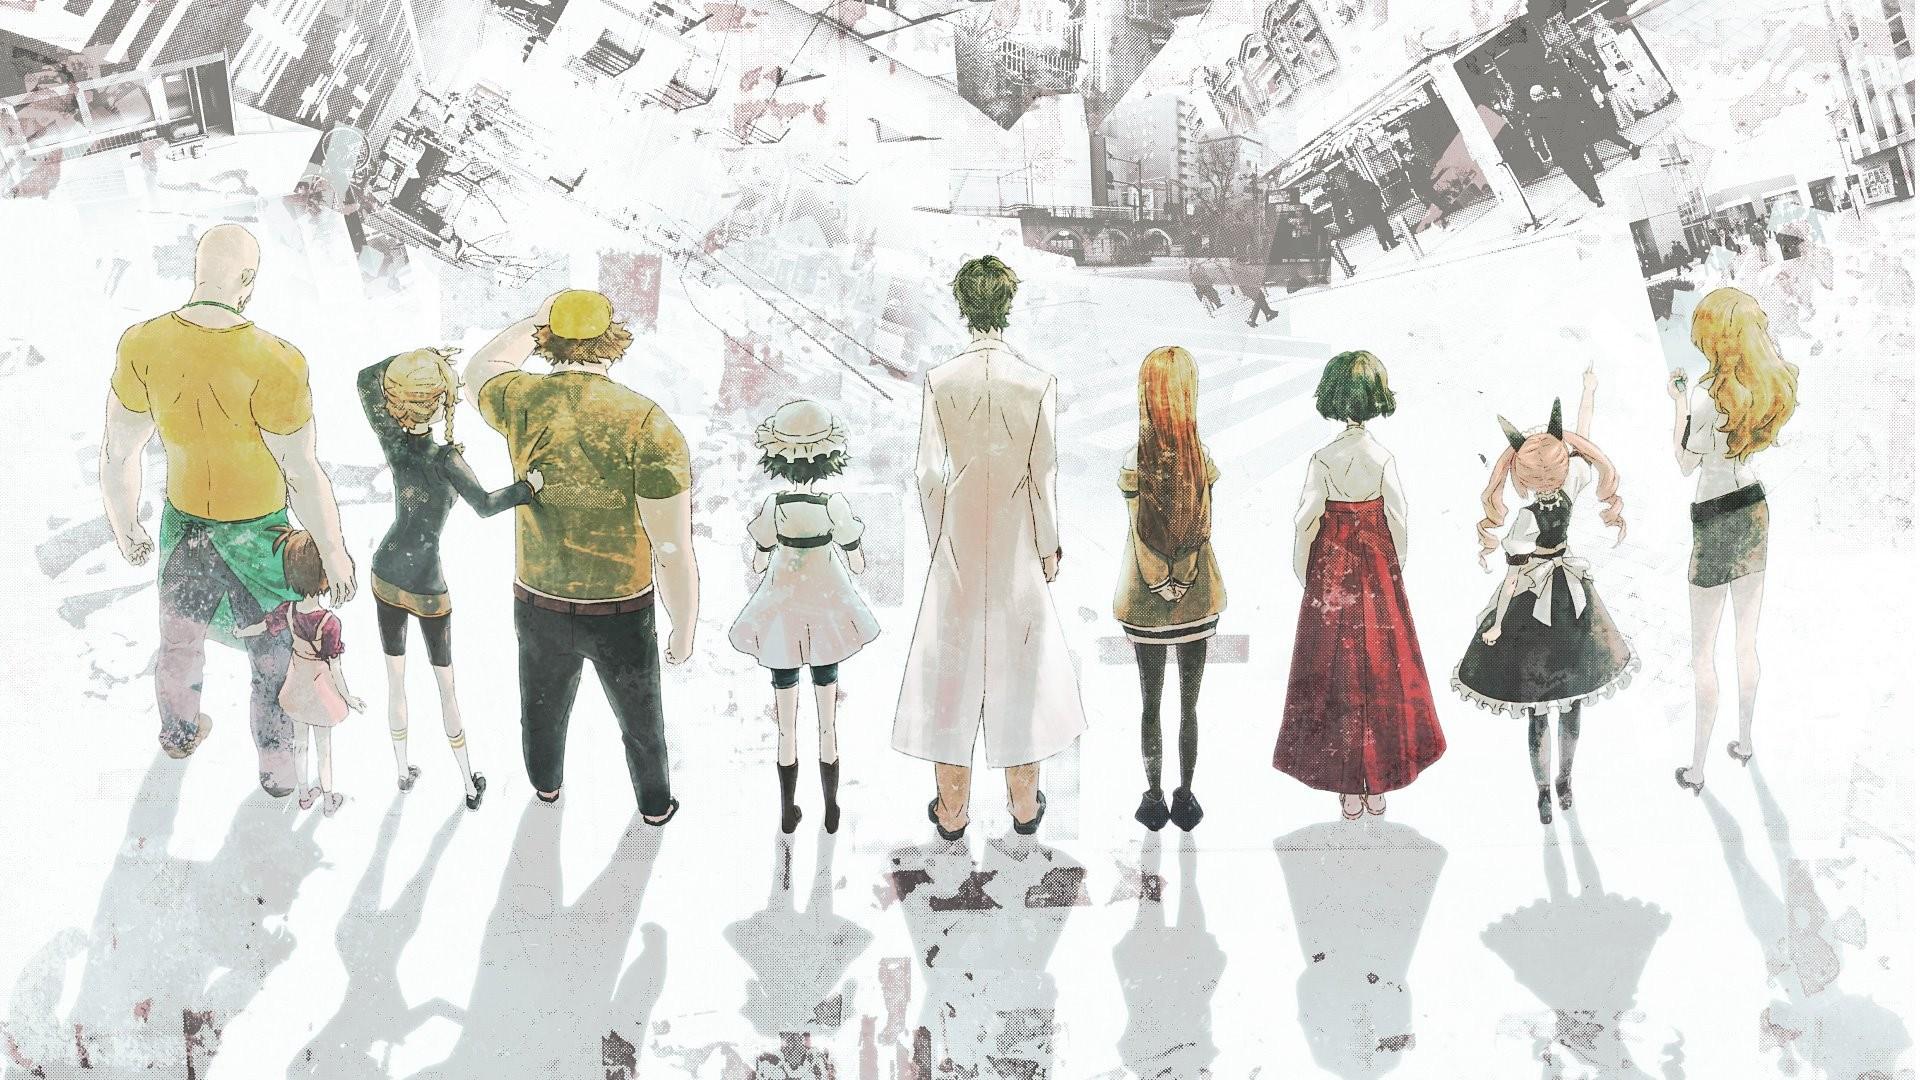 Tapety Vykres Ilustrace Anime Zima Moda Steins Gate Jaro